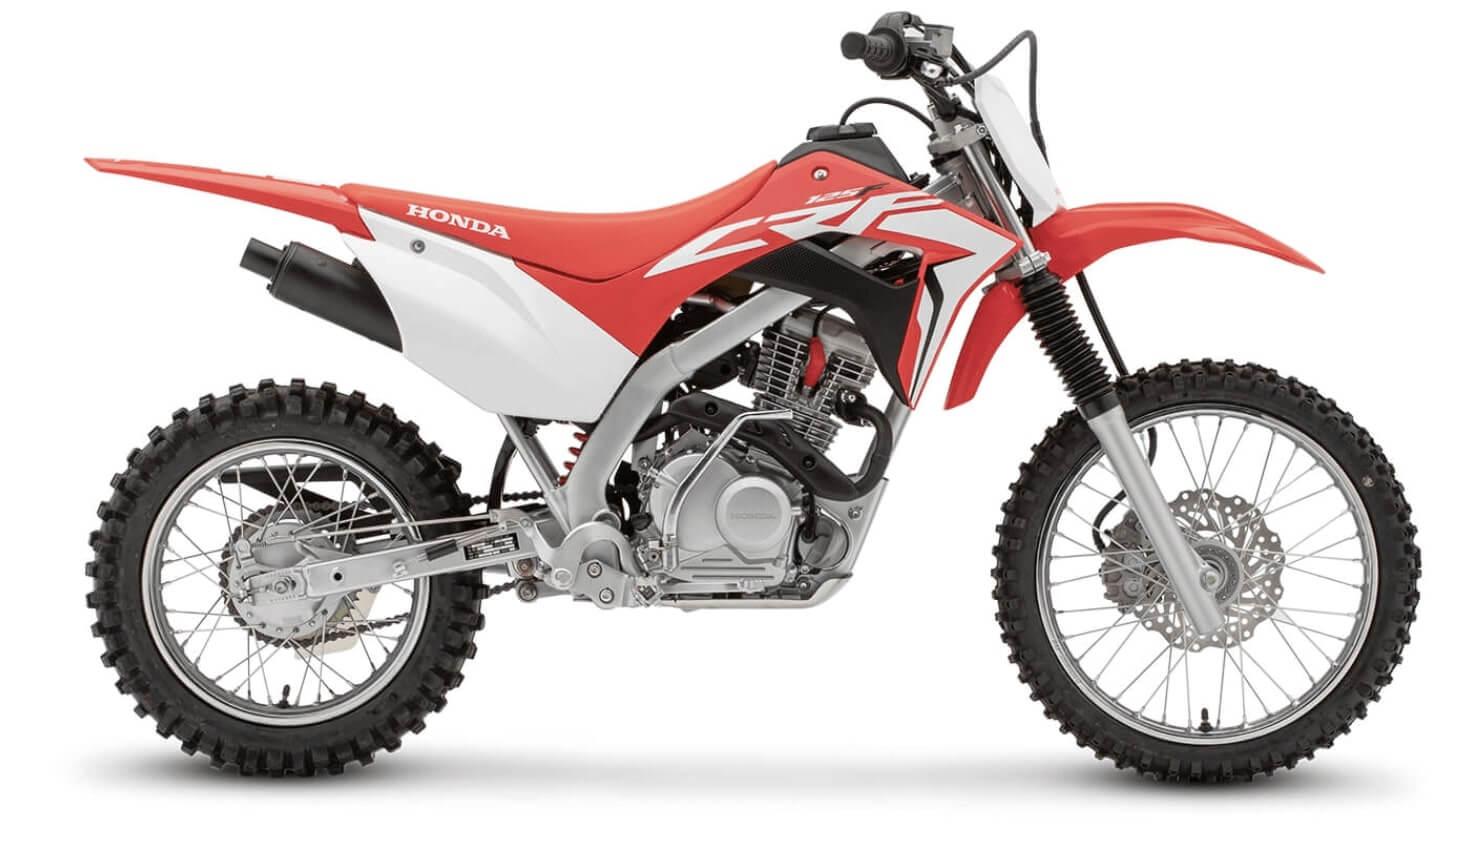 Standard 2021 Pit bike by Honda